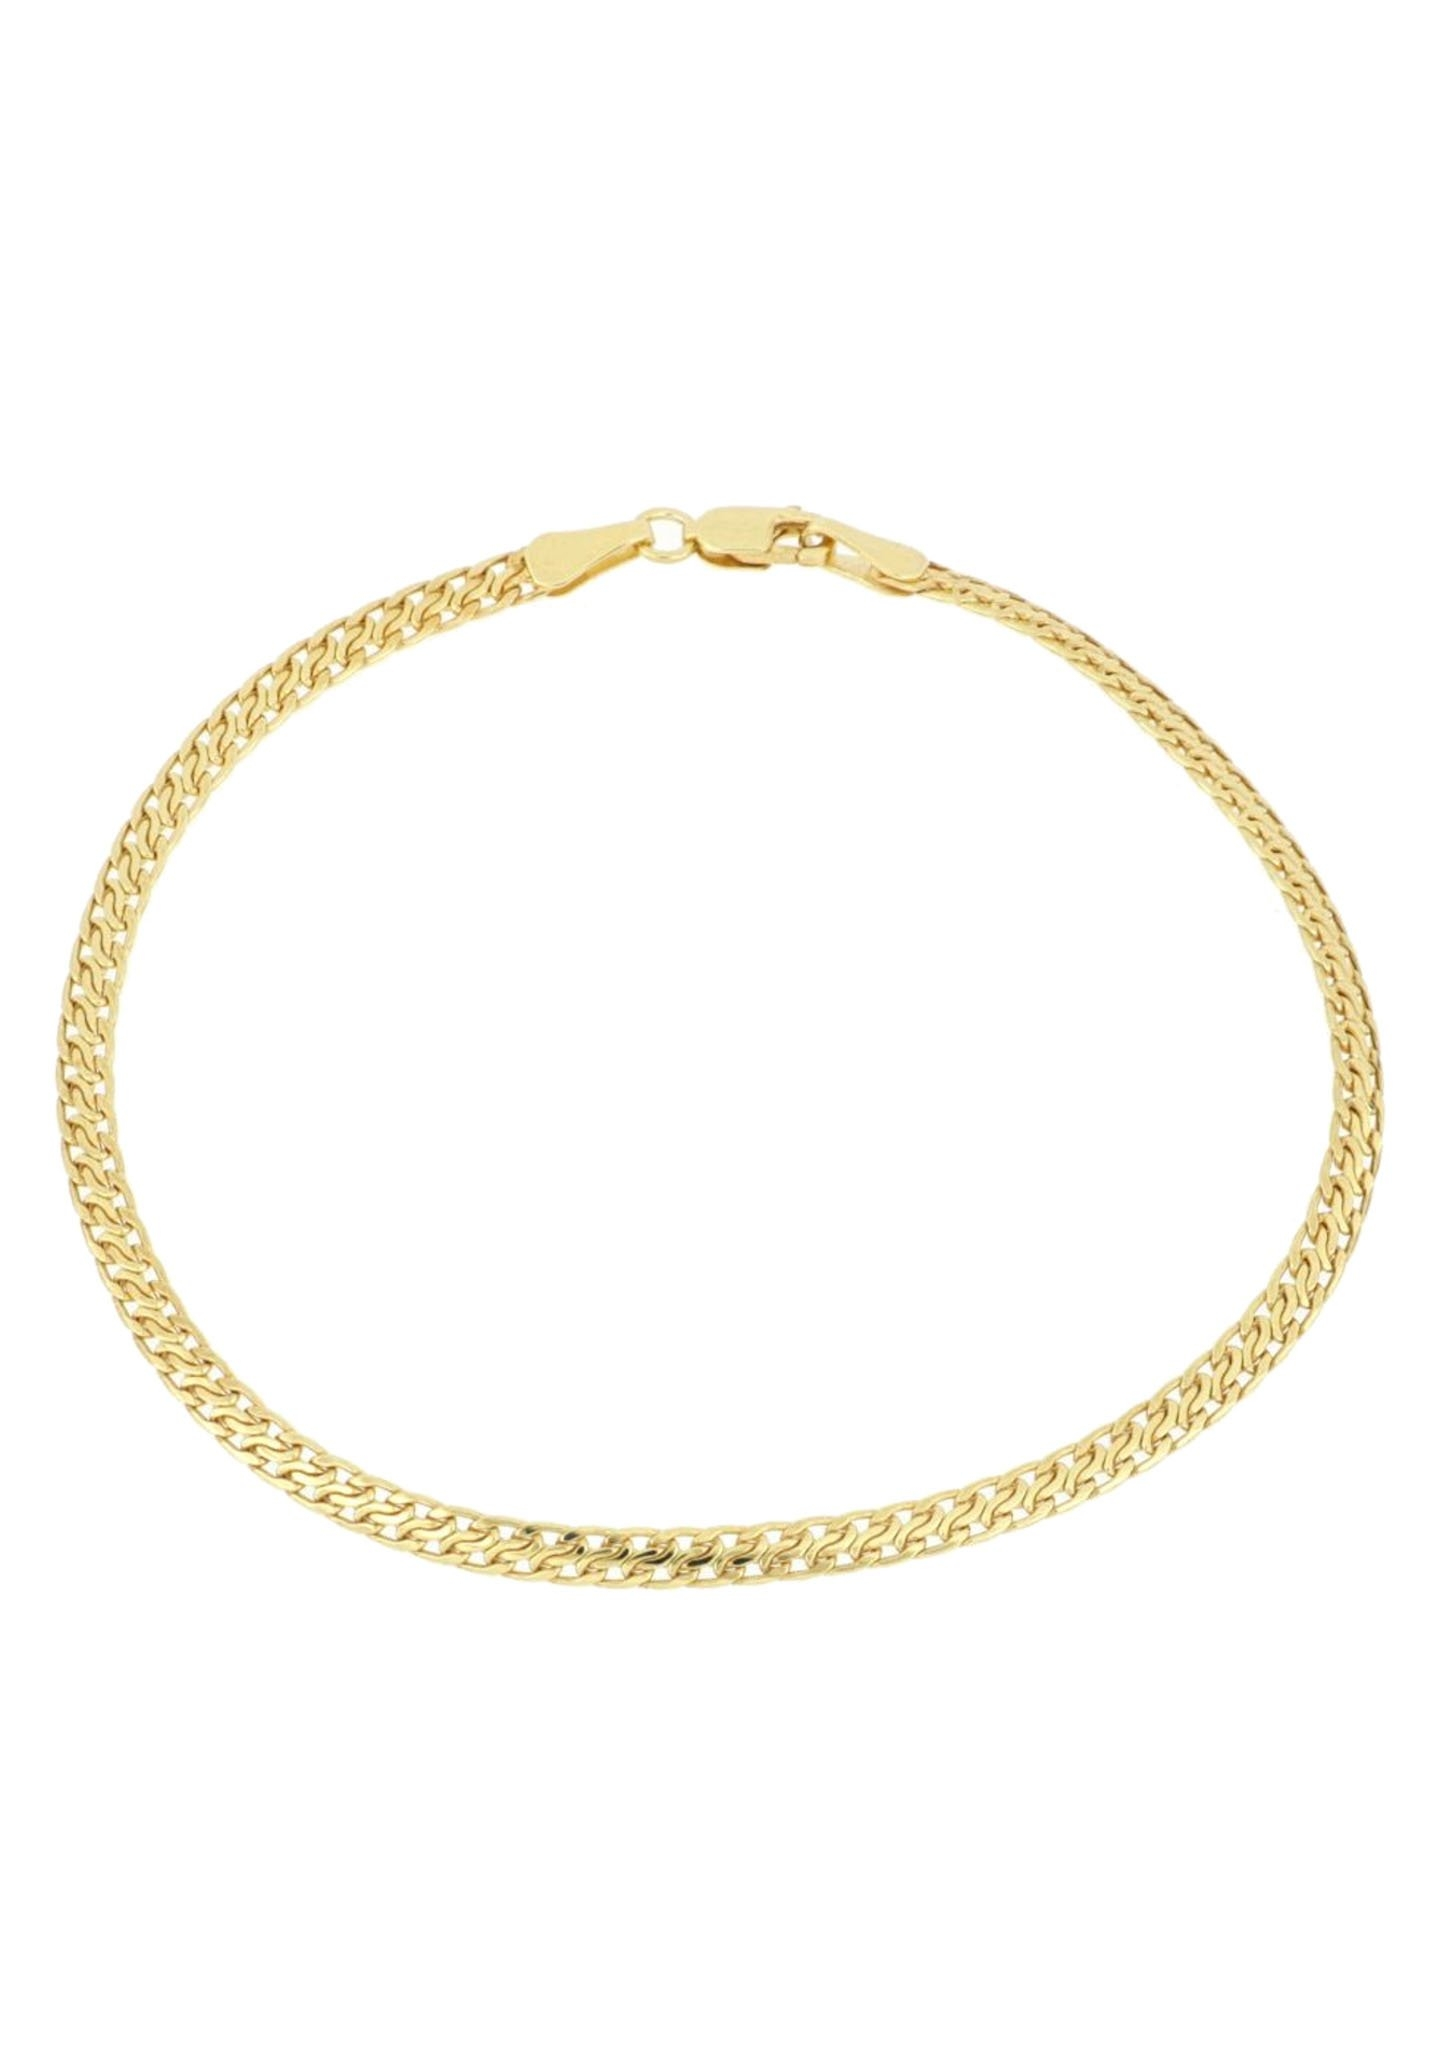 Firetti goudkleurige armband Met pantserschakels, 3,2 mm breed, geribbelde gediamanteerde verwerking, glans-look nu online kopen bij OTTO